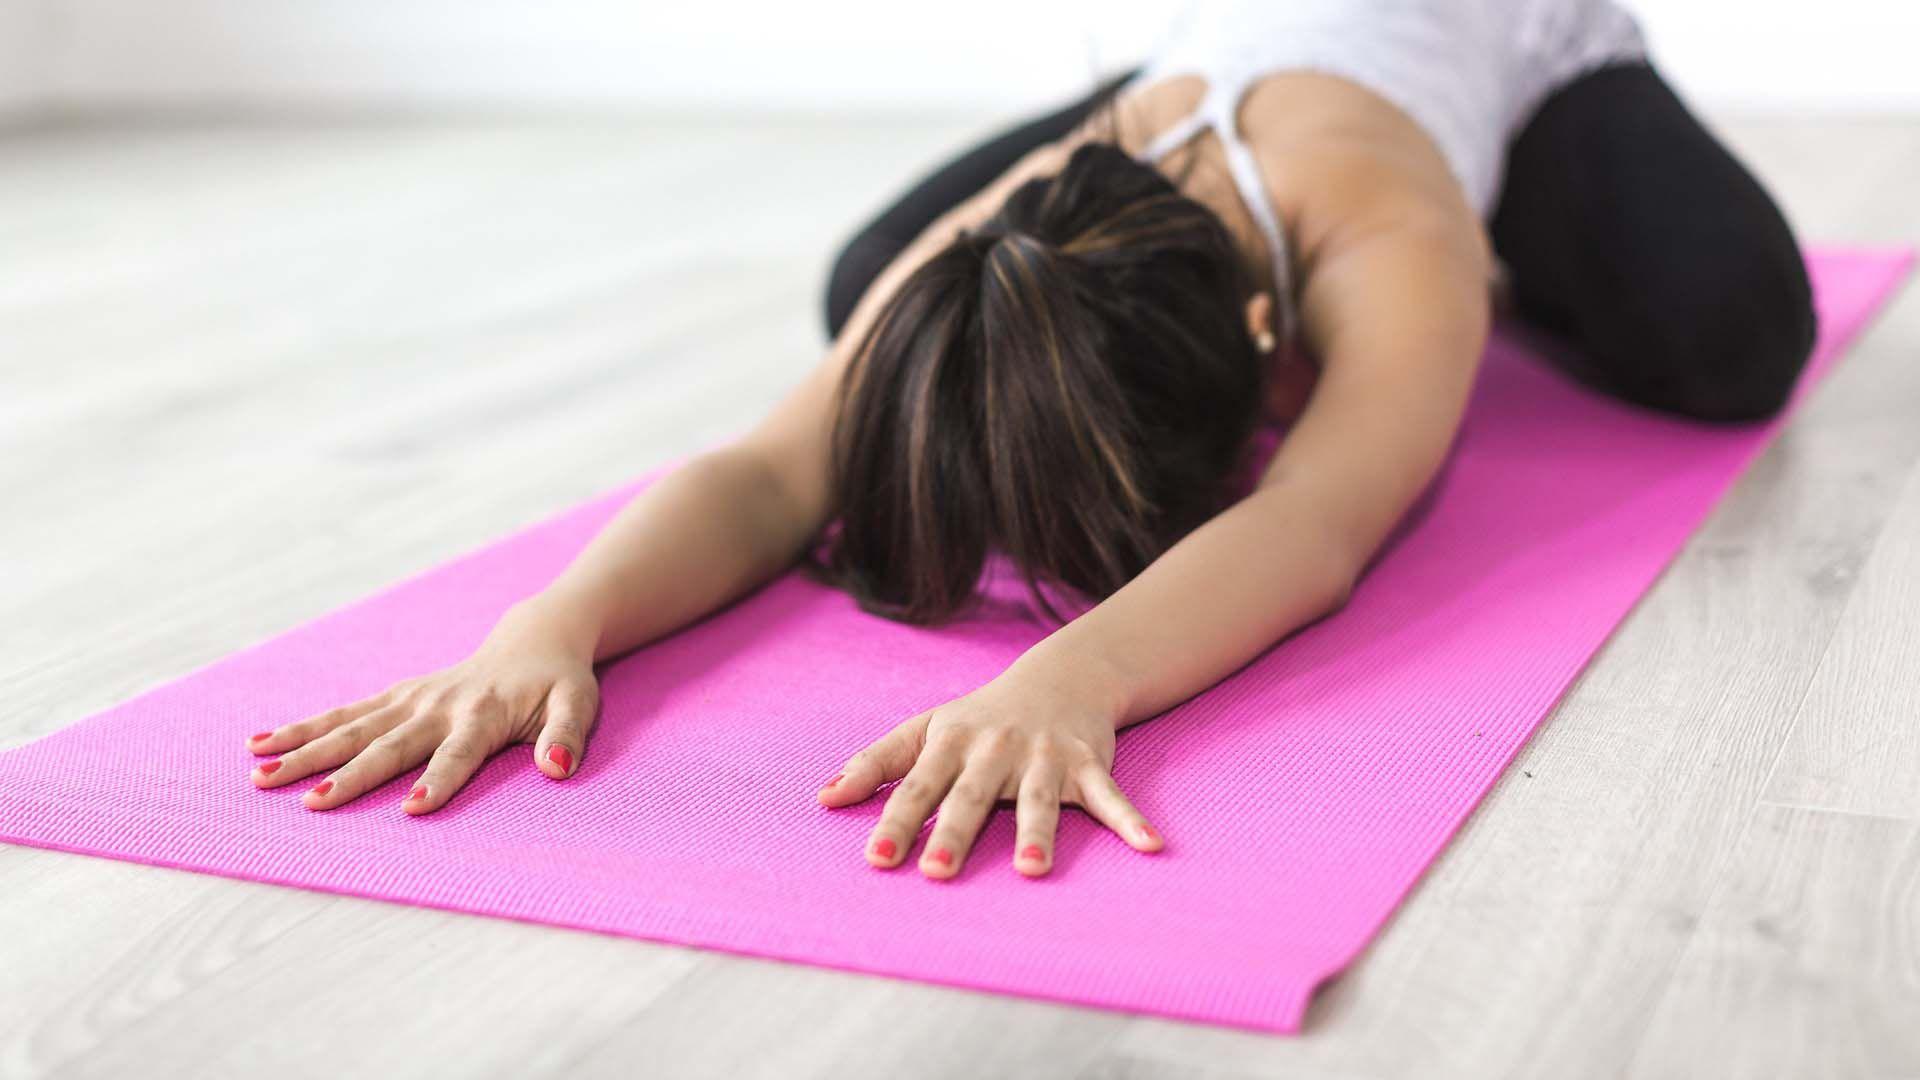 Yoga Teacher Training Classes in Winter Springs, Florida